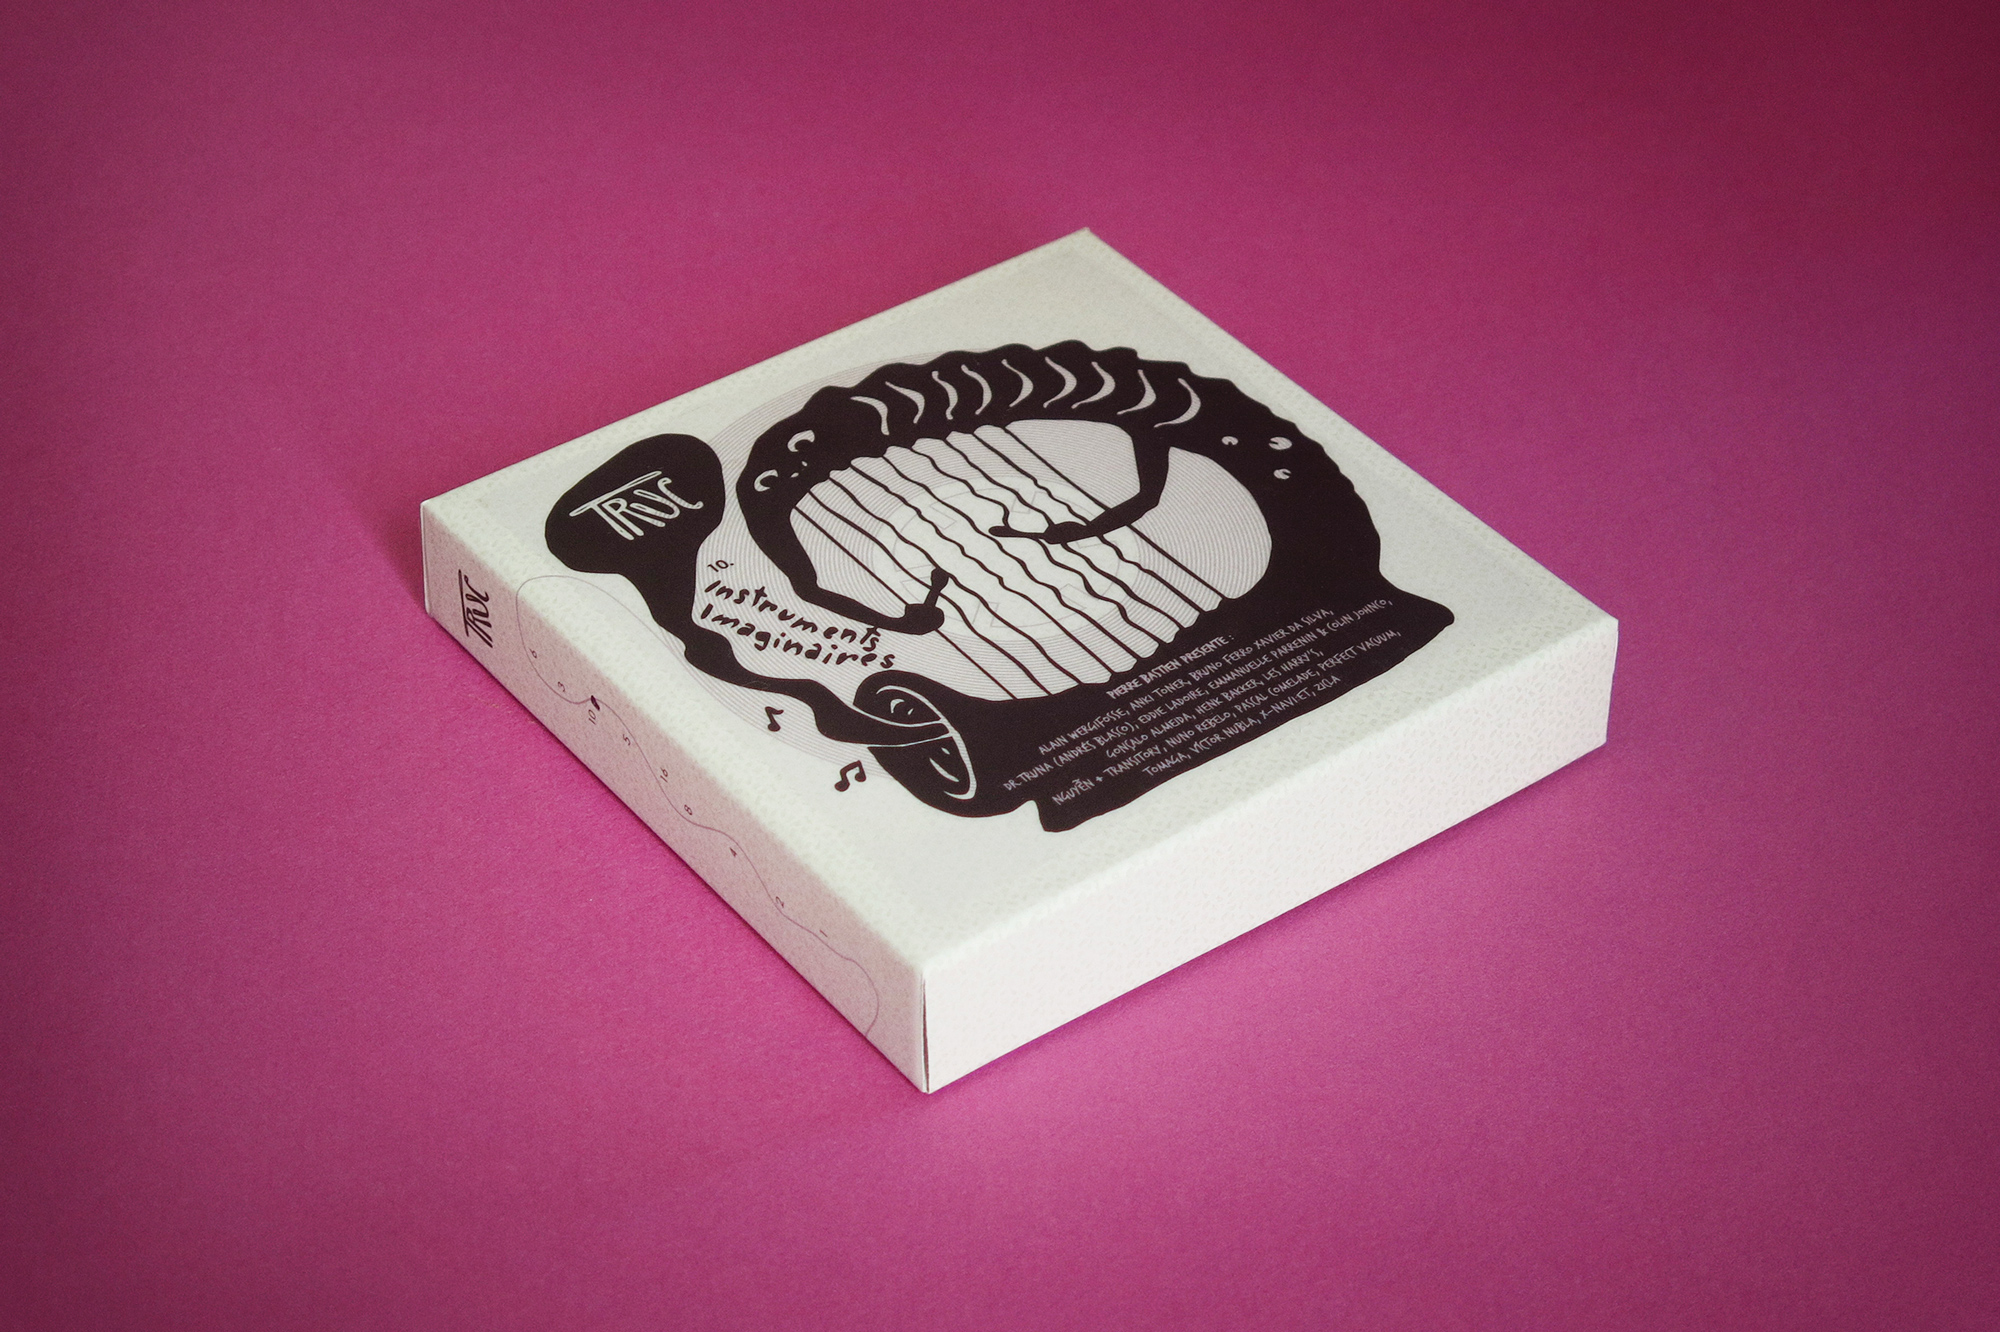 Truc: boxset and audio tape